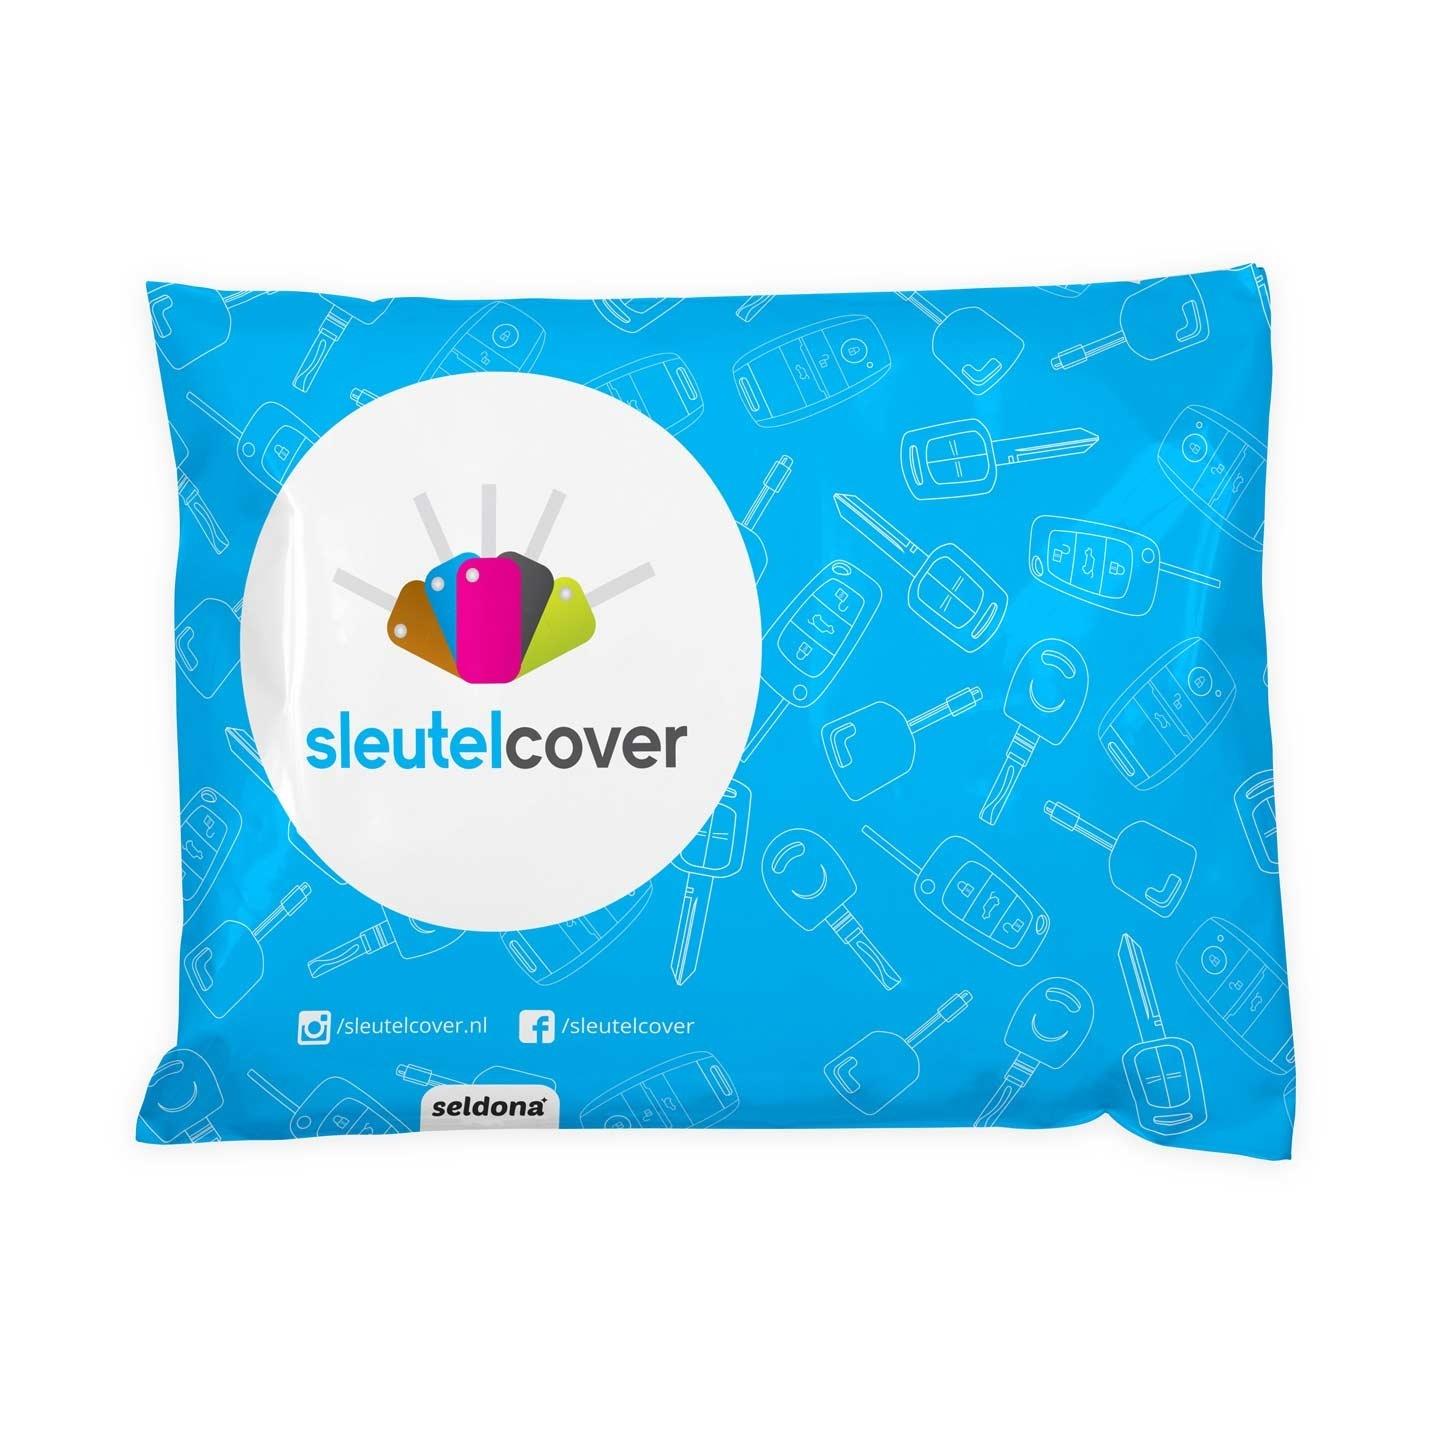 Seat SleutelCover - Oranje / Silicone sleutelhoesje / beschermhoesje autosleutel